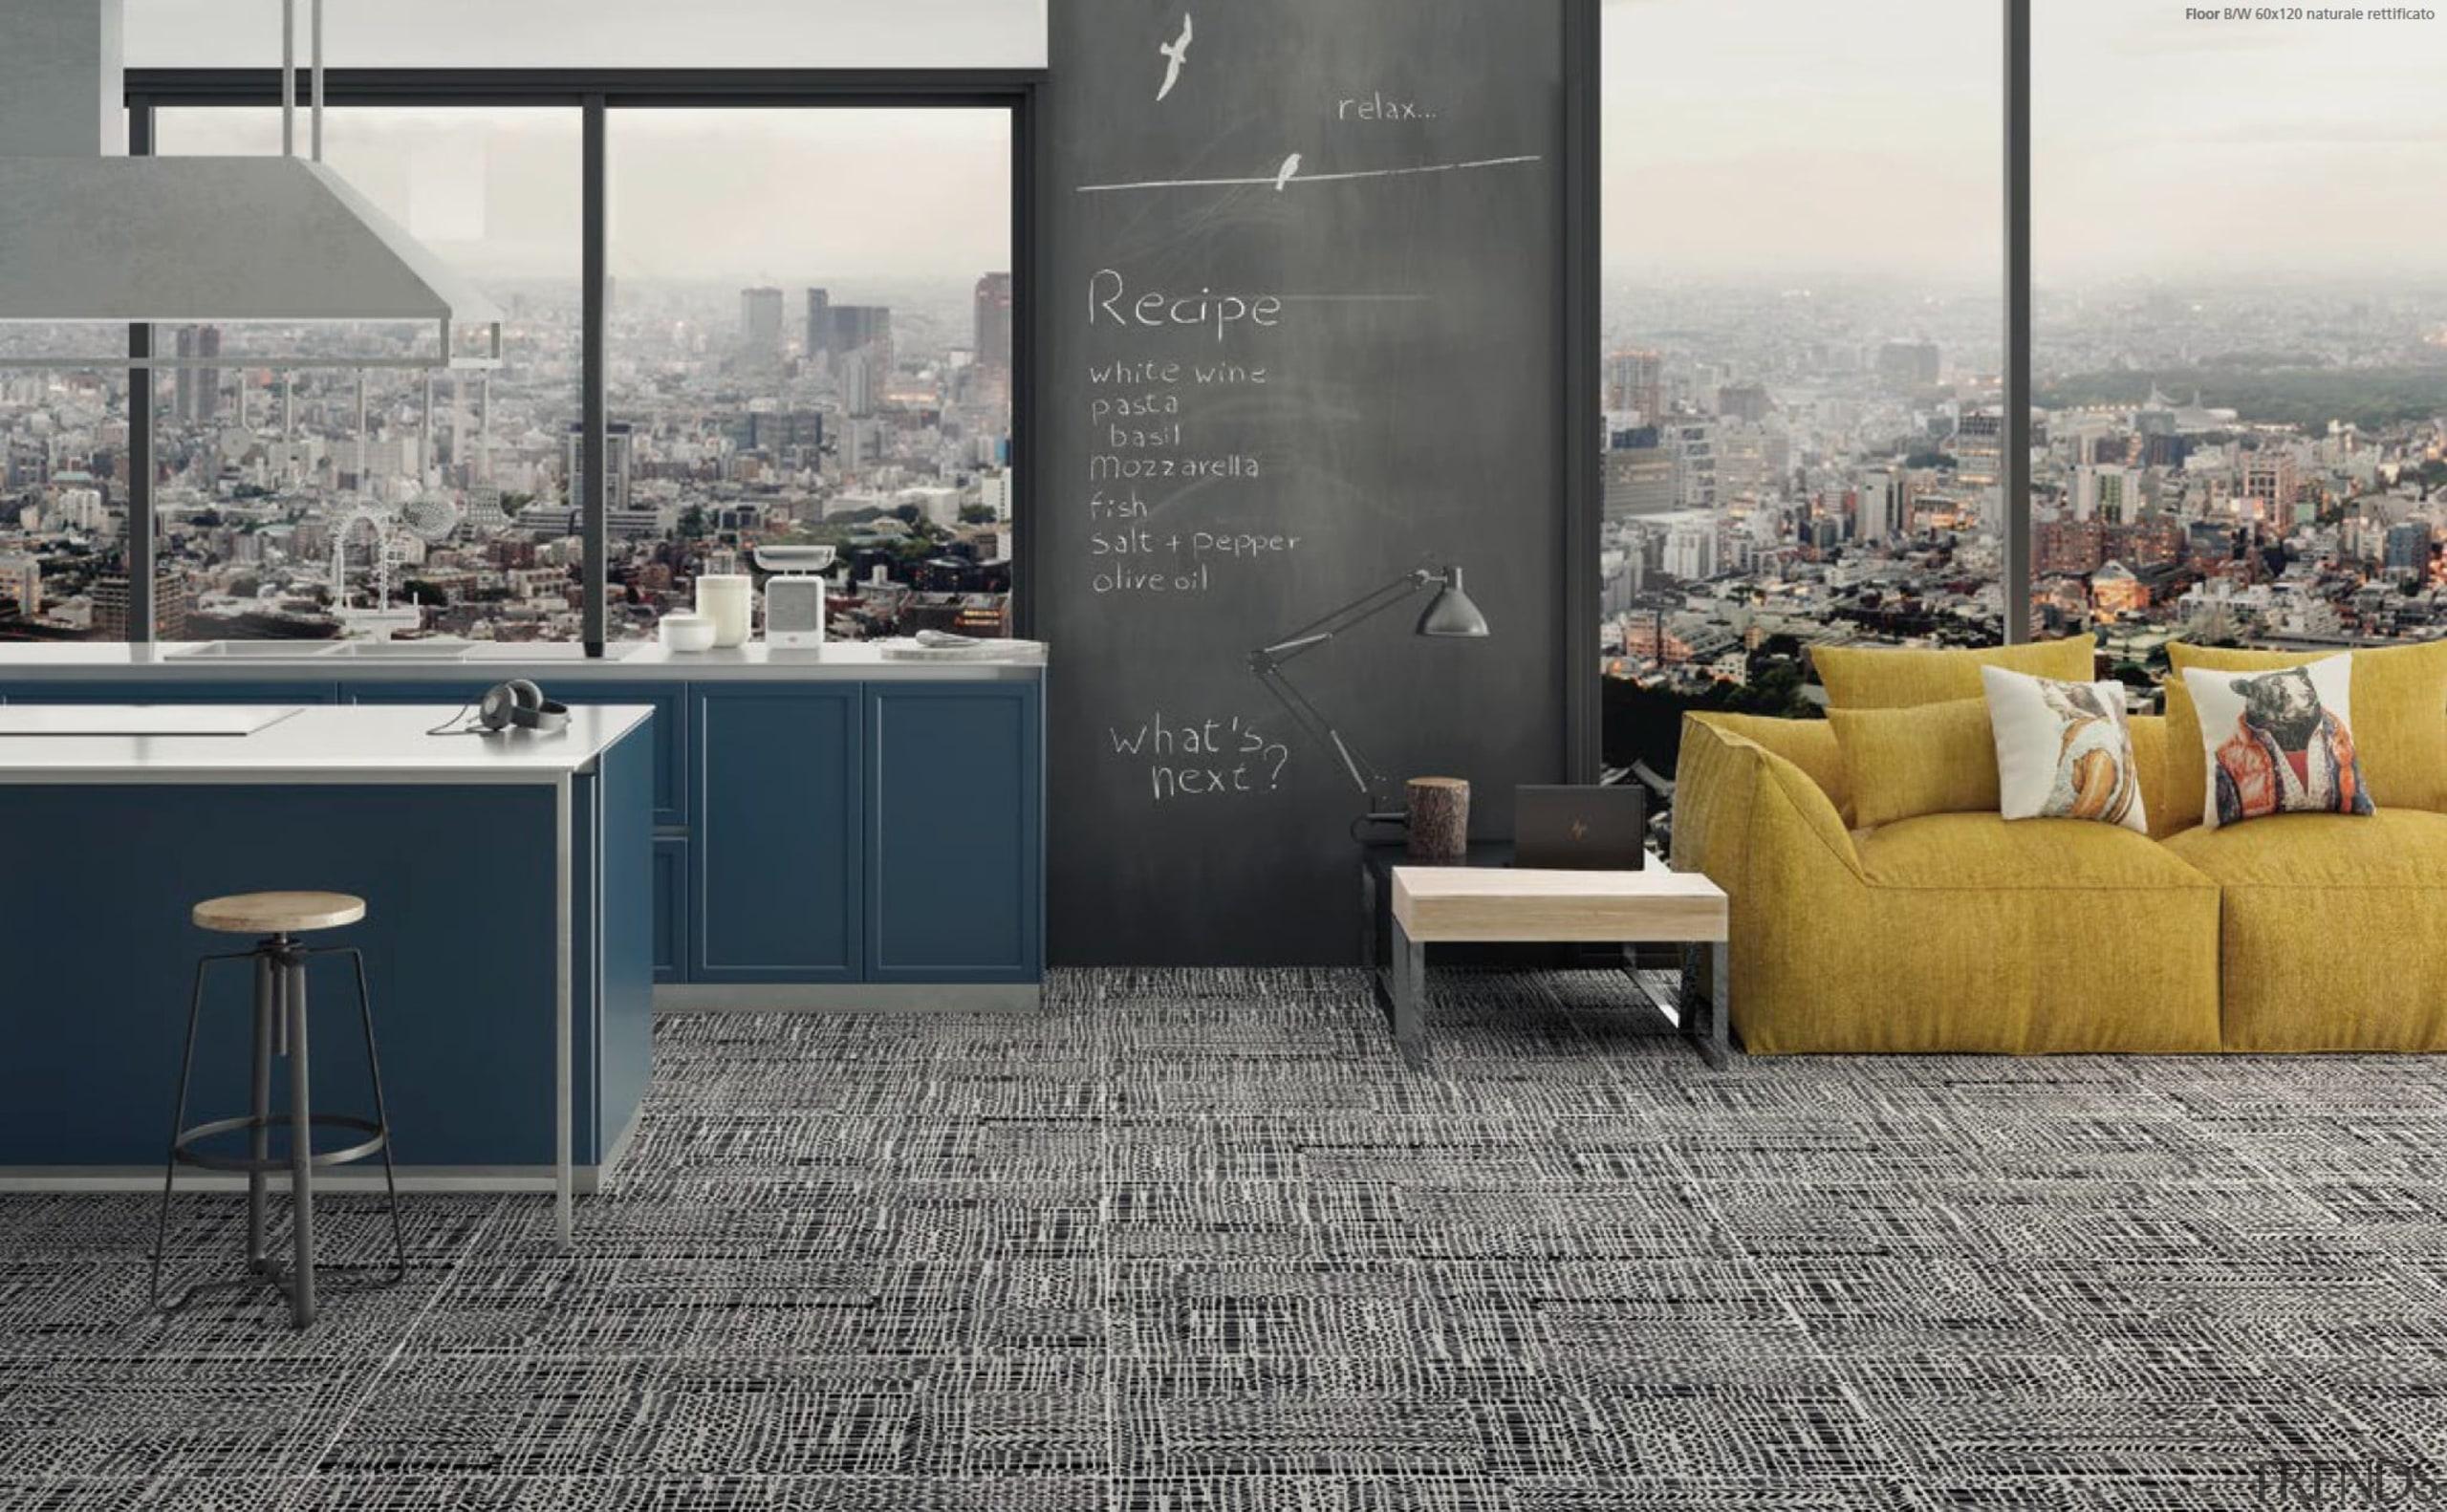 Craft Black & White 600x600 - Craft Black floor, flooring, furniture, interior design, tile, wall, gray, black